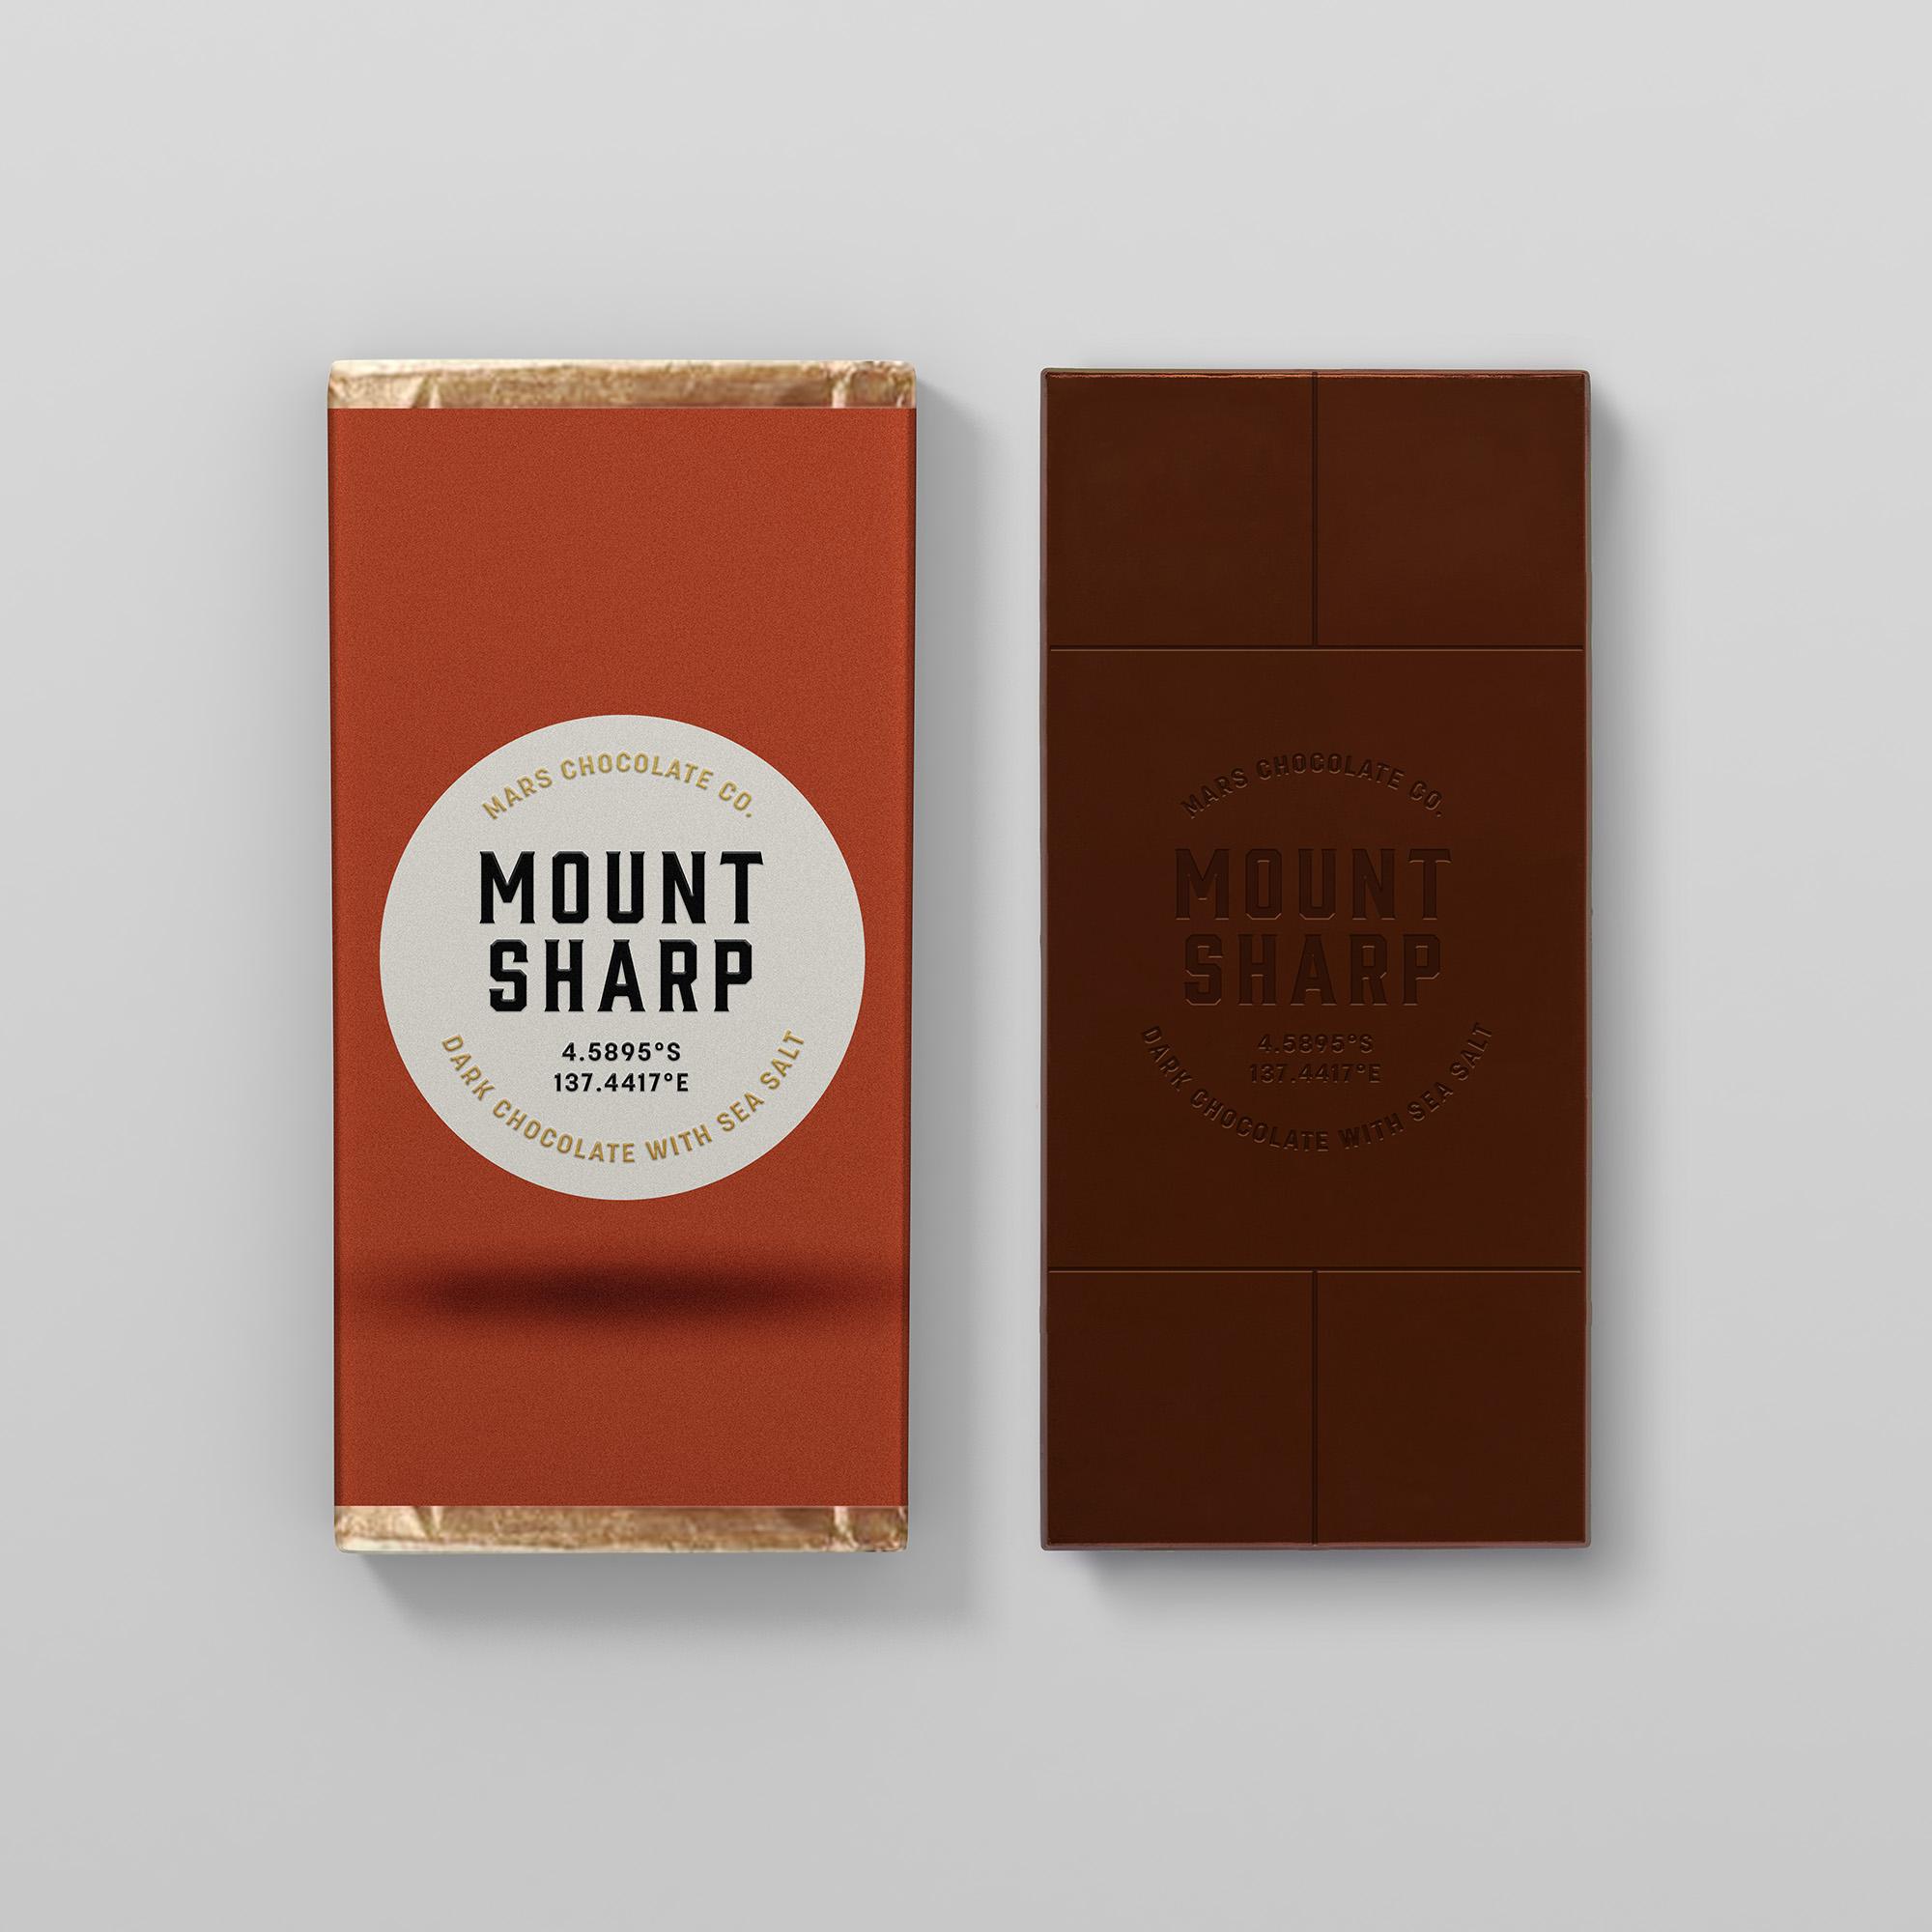 Mount Sharp dark chocolate packaging Franziska Böttcher